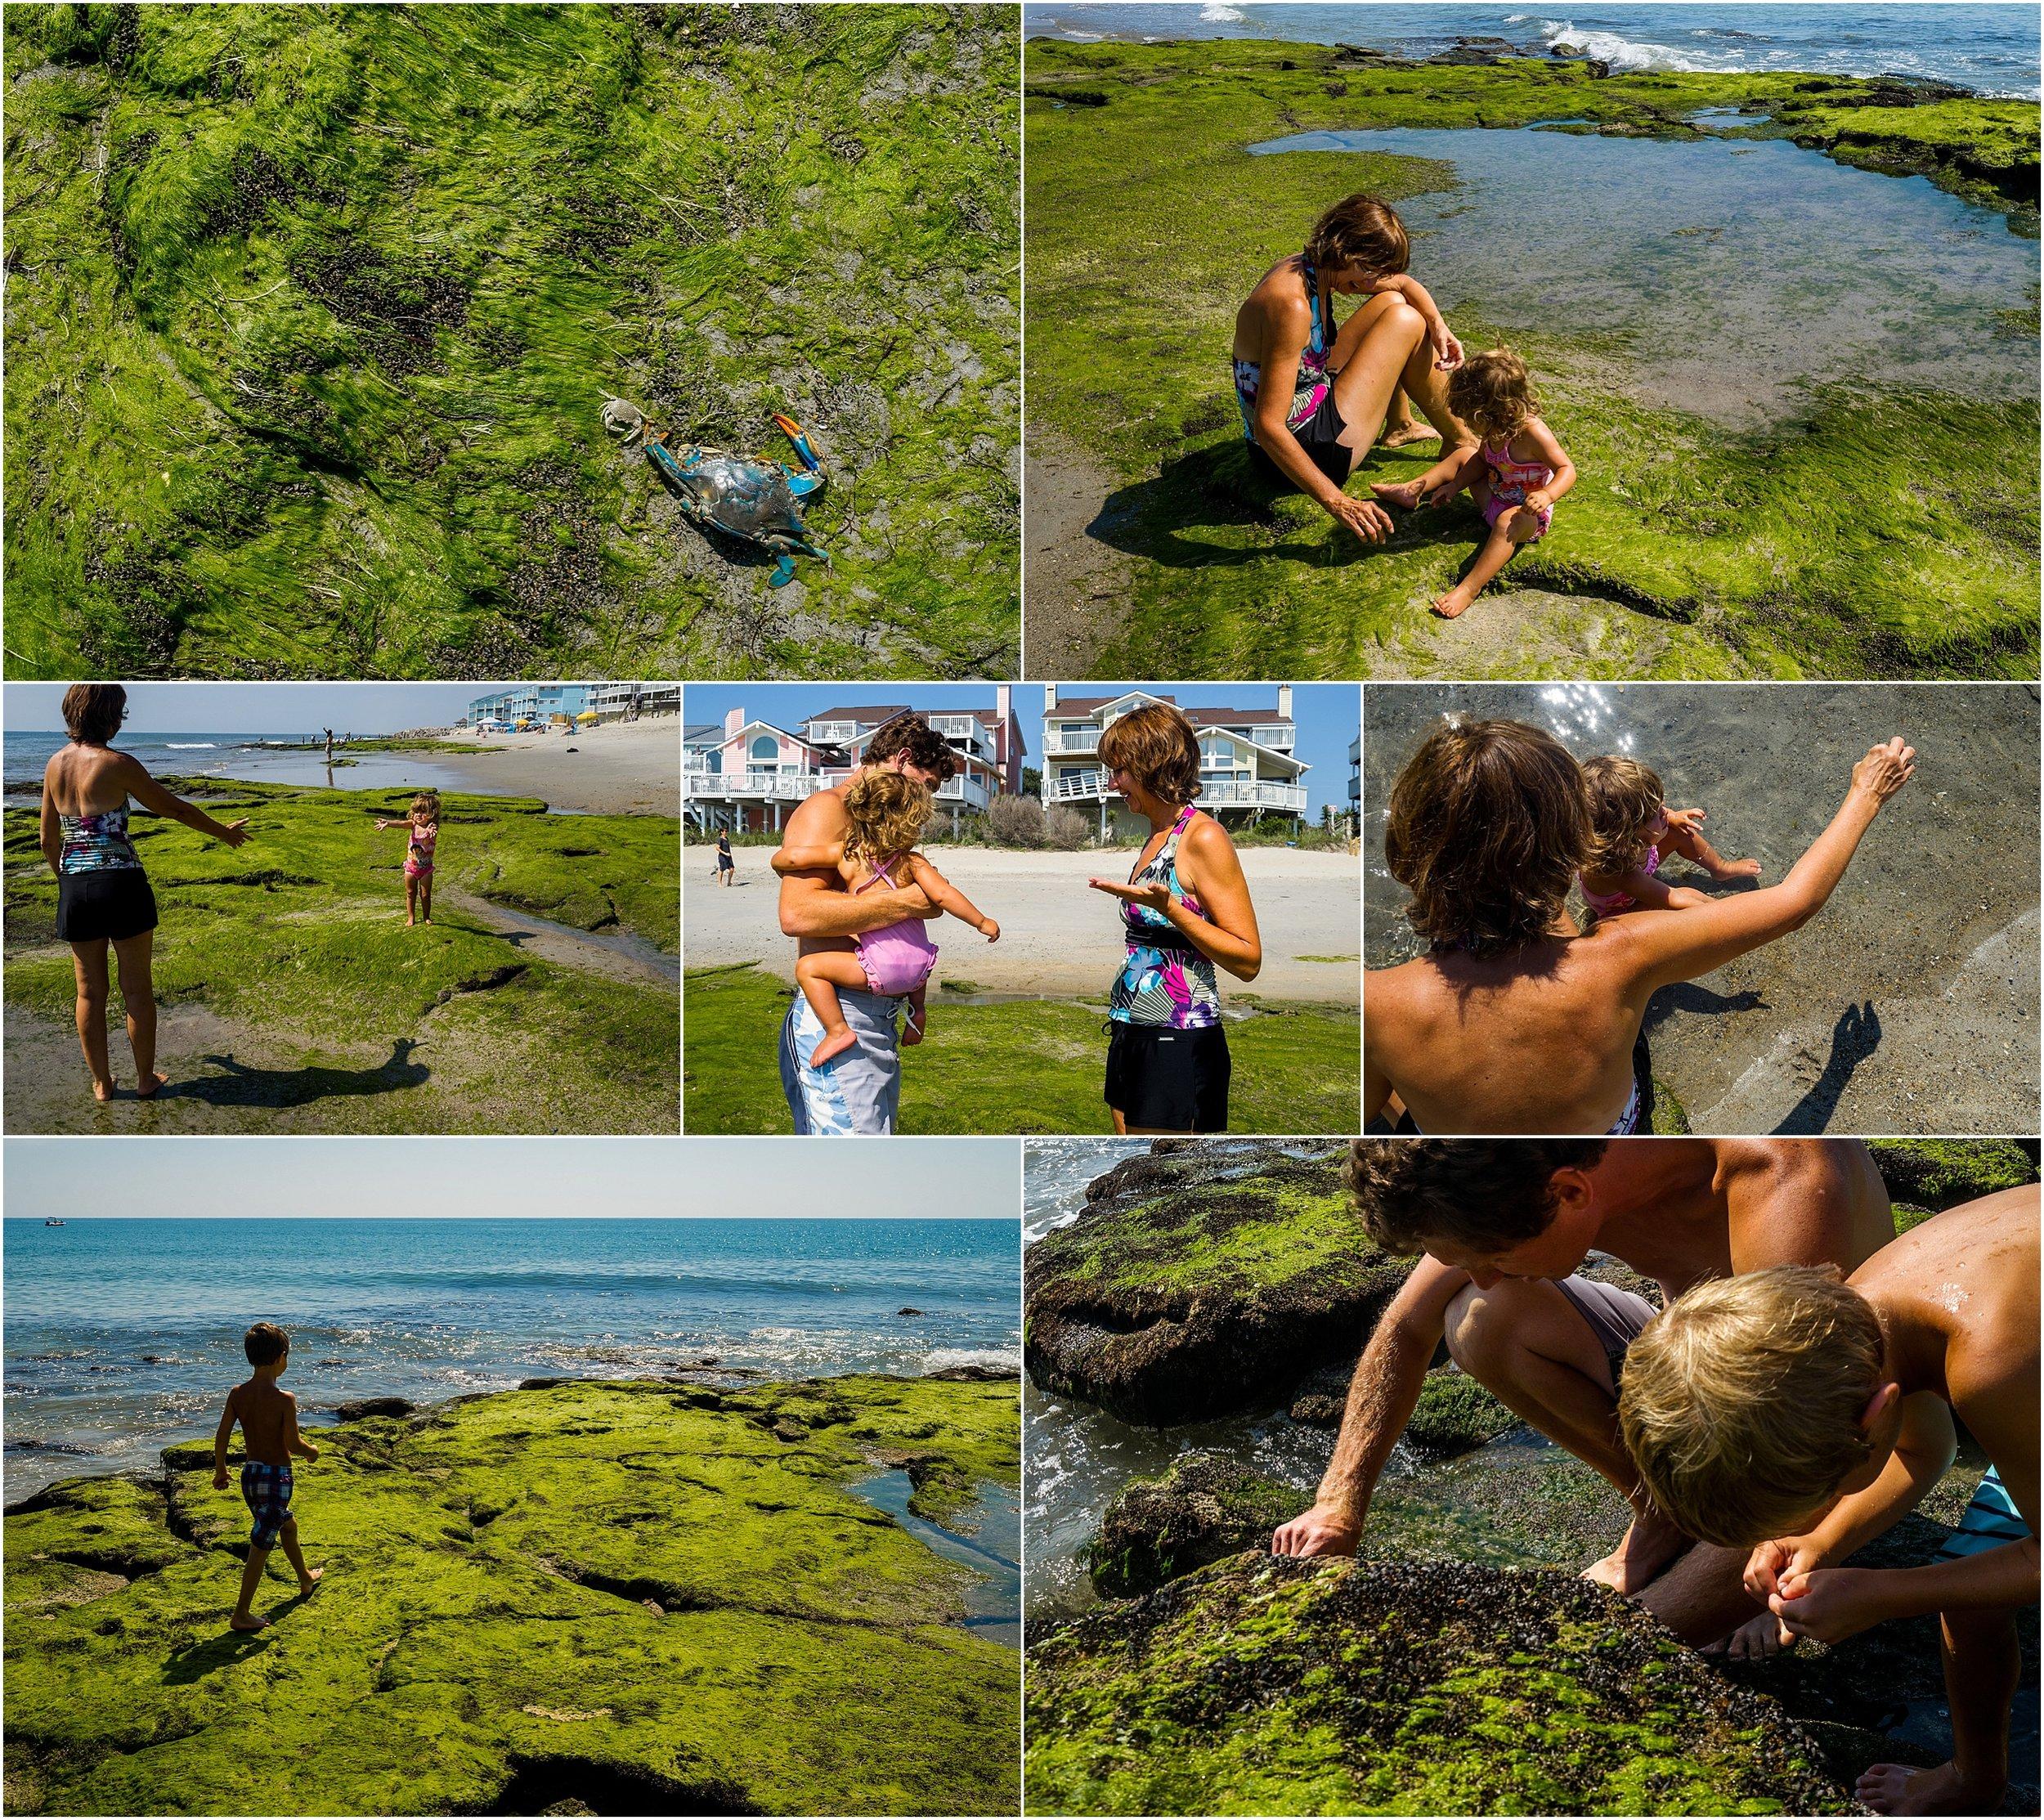 Kure Beach Green Beach Holli Pool Photographer